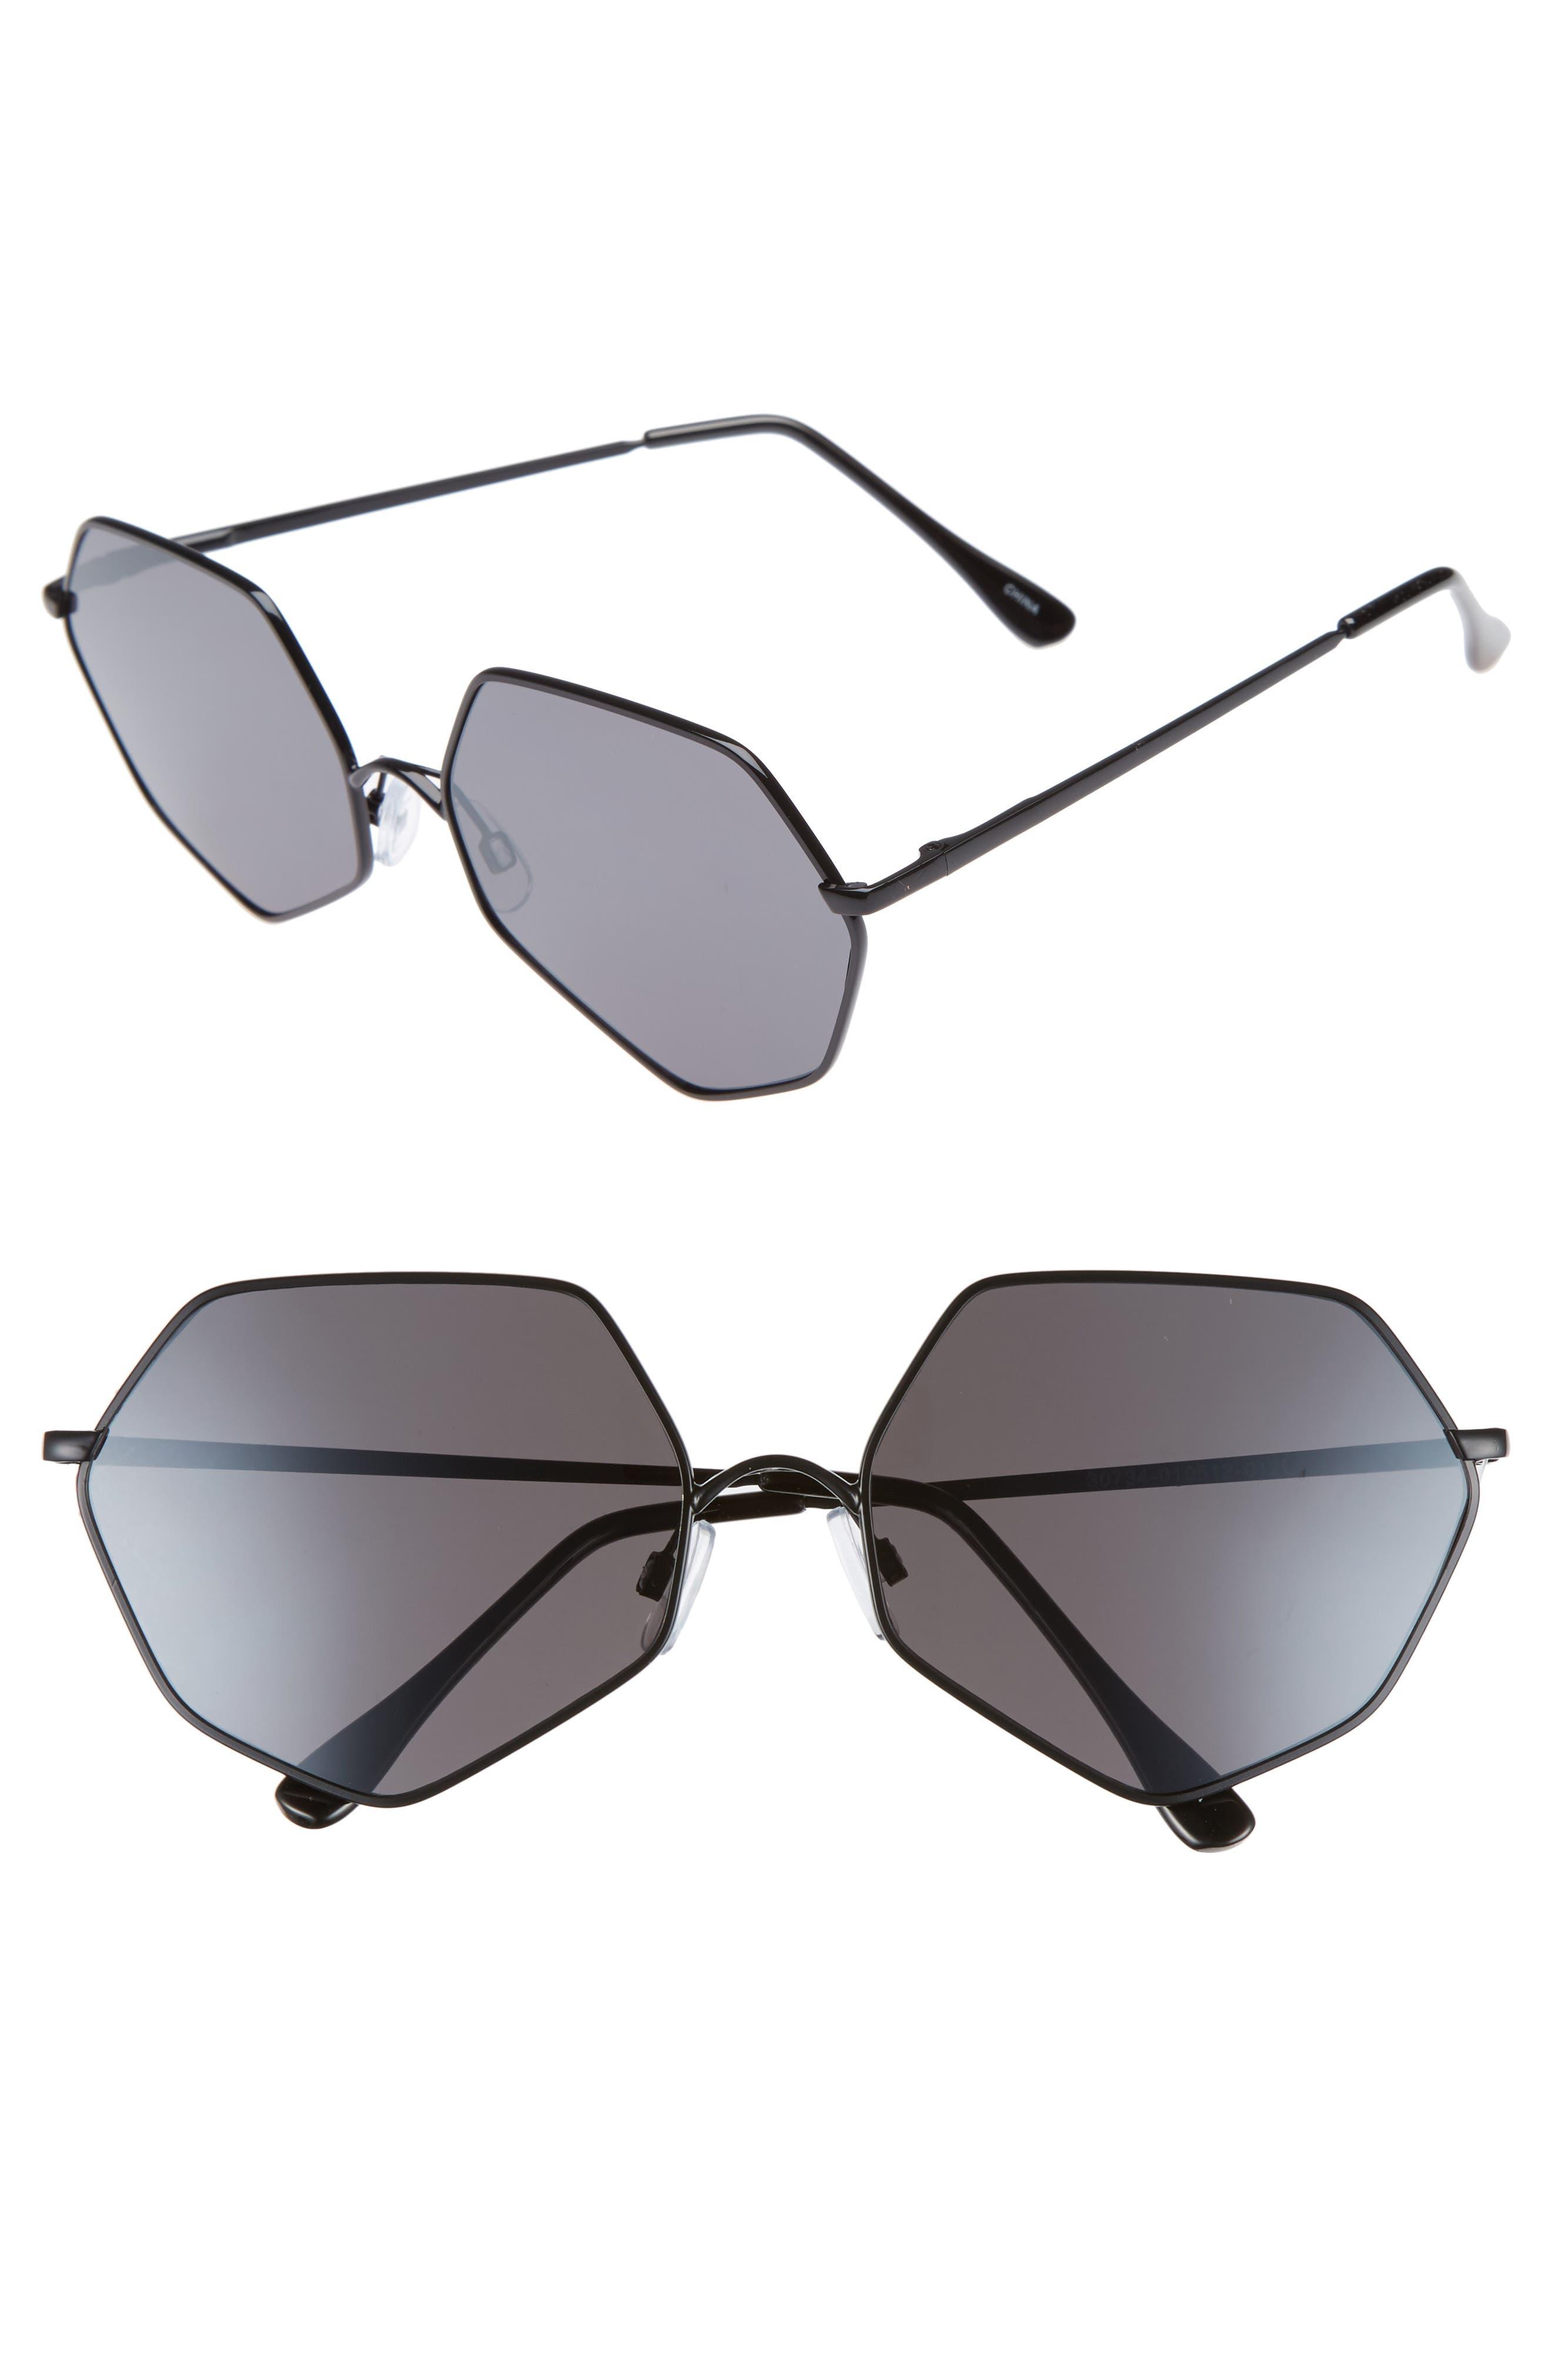 60 mm Geometric Metal Aviator Sunglasses,                             Main thumbnail 1, color,                             001